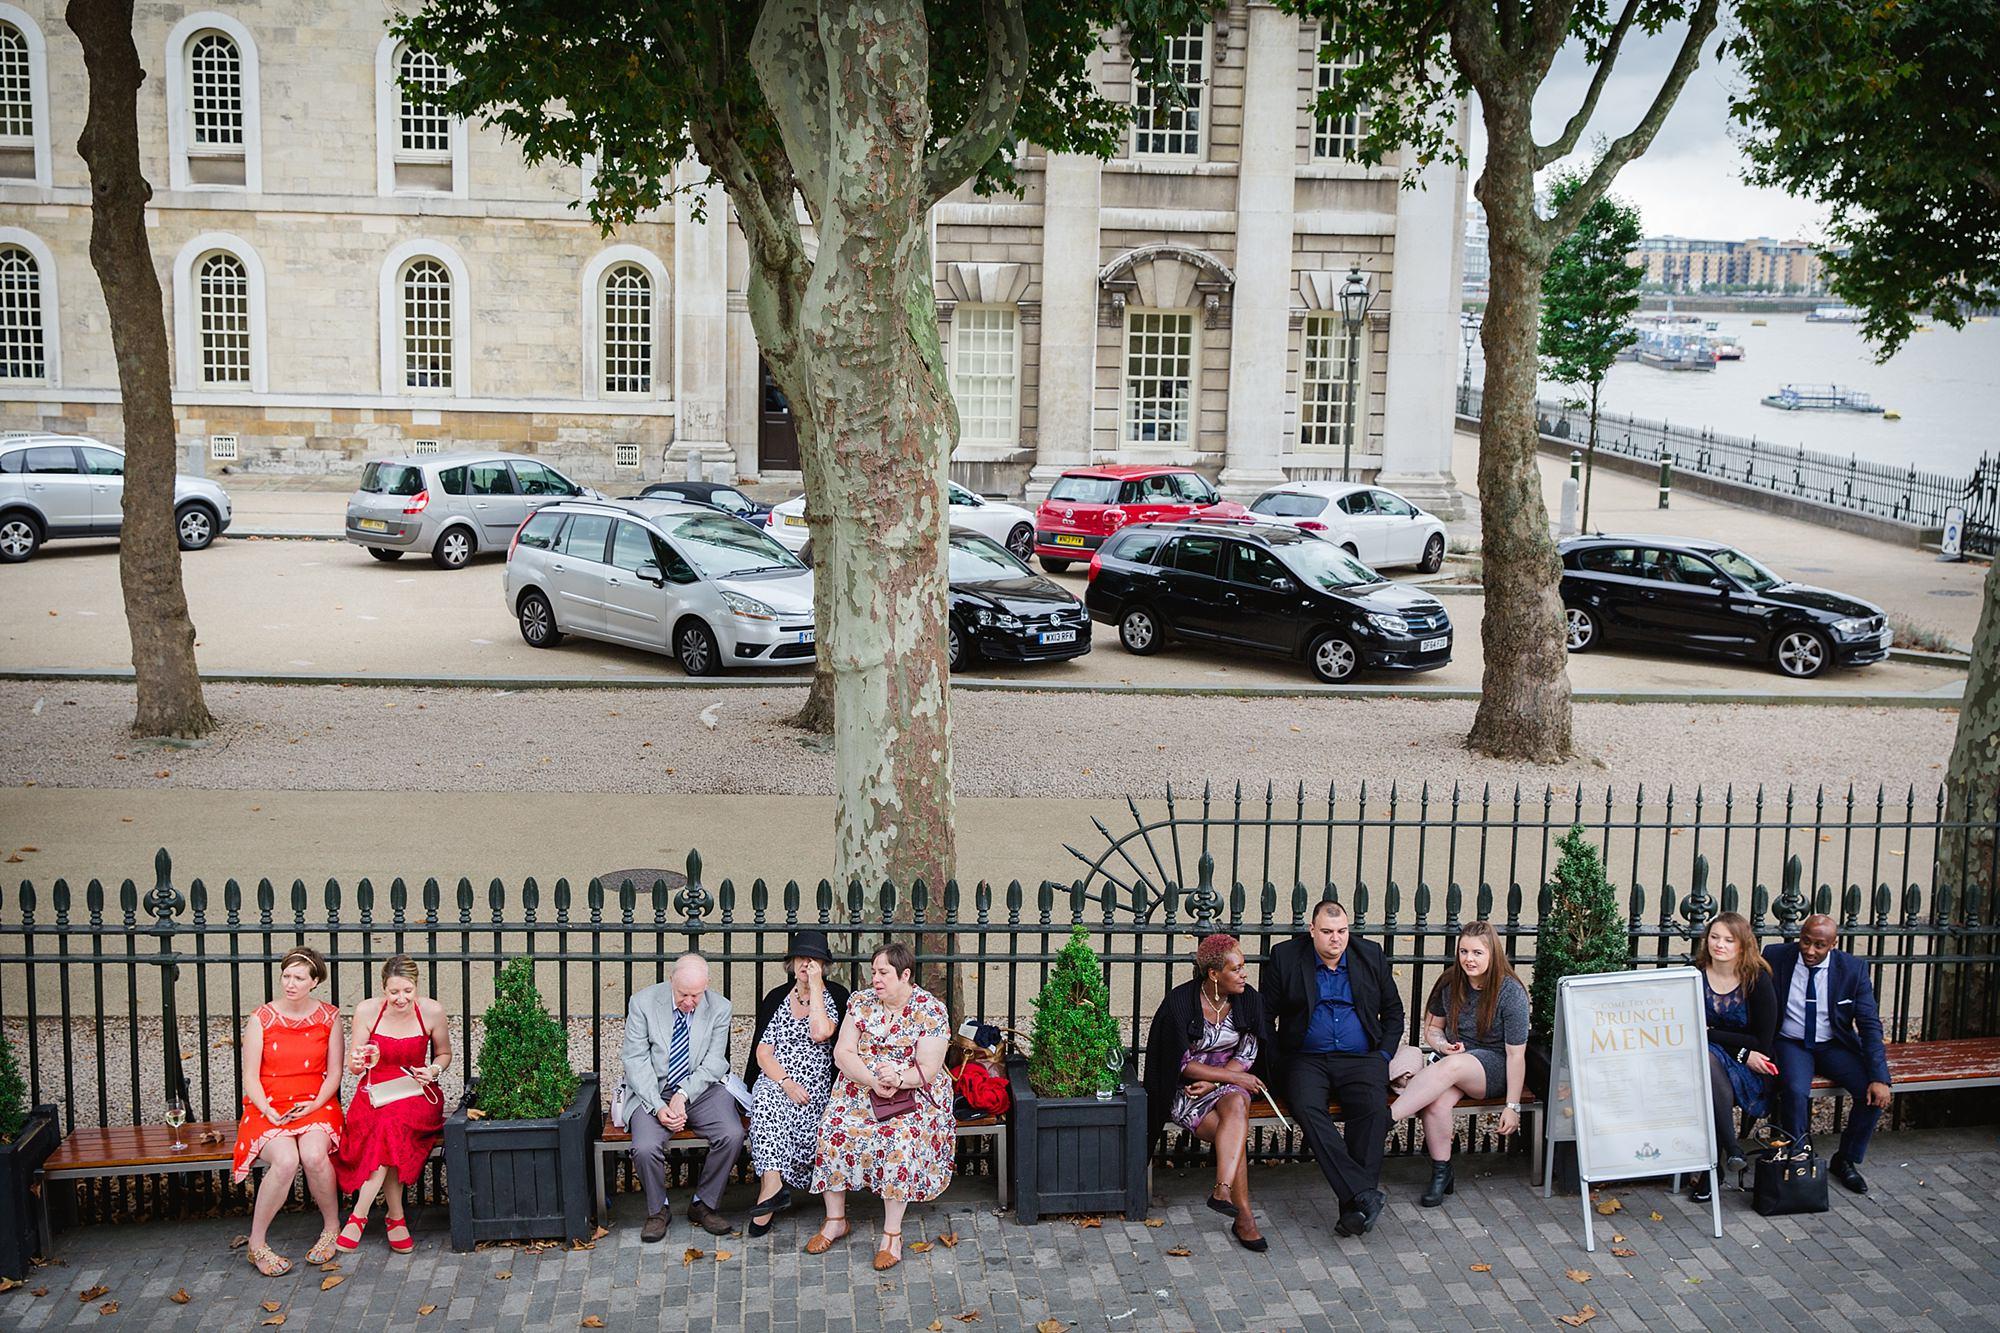 Trafalgar Tavern wedding guests chatting outside pub